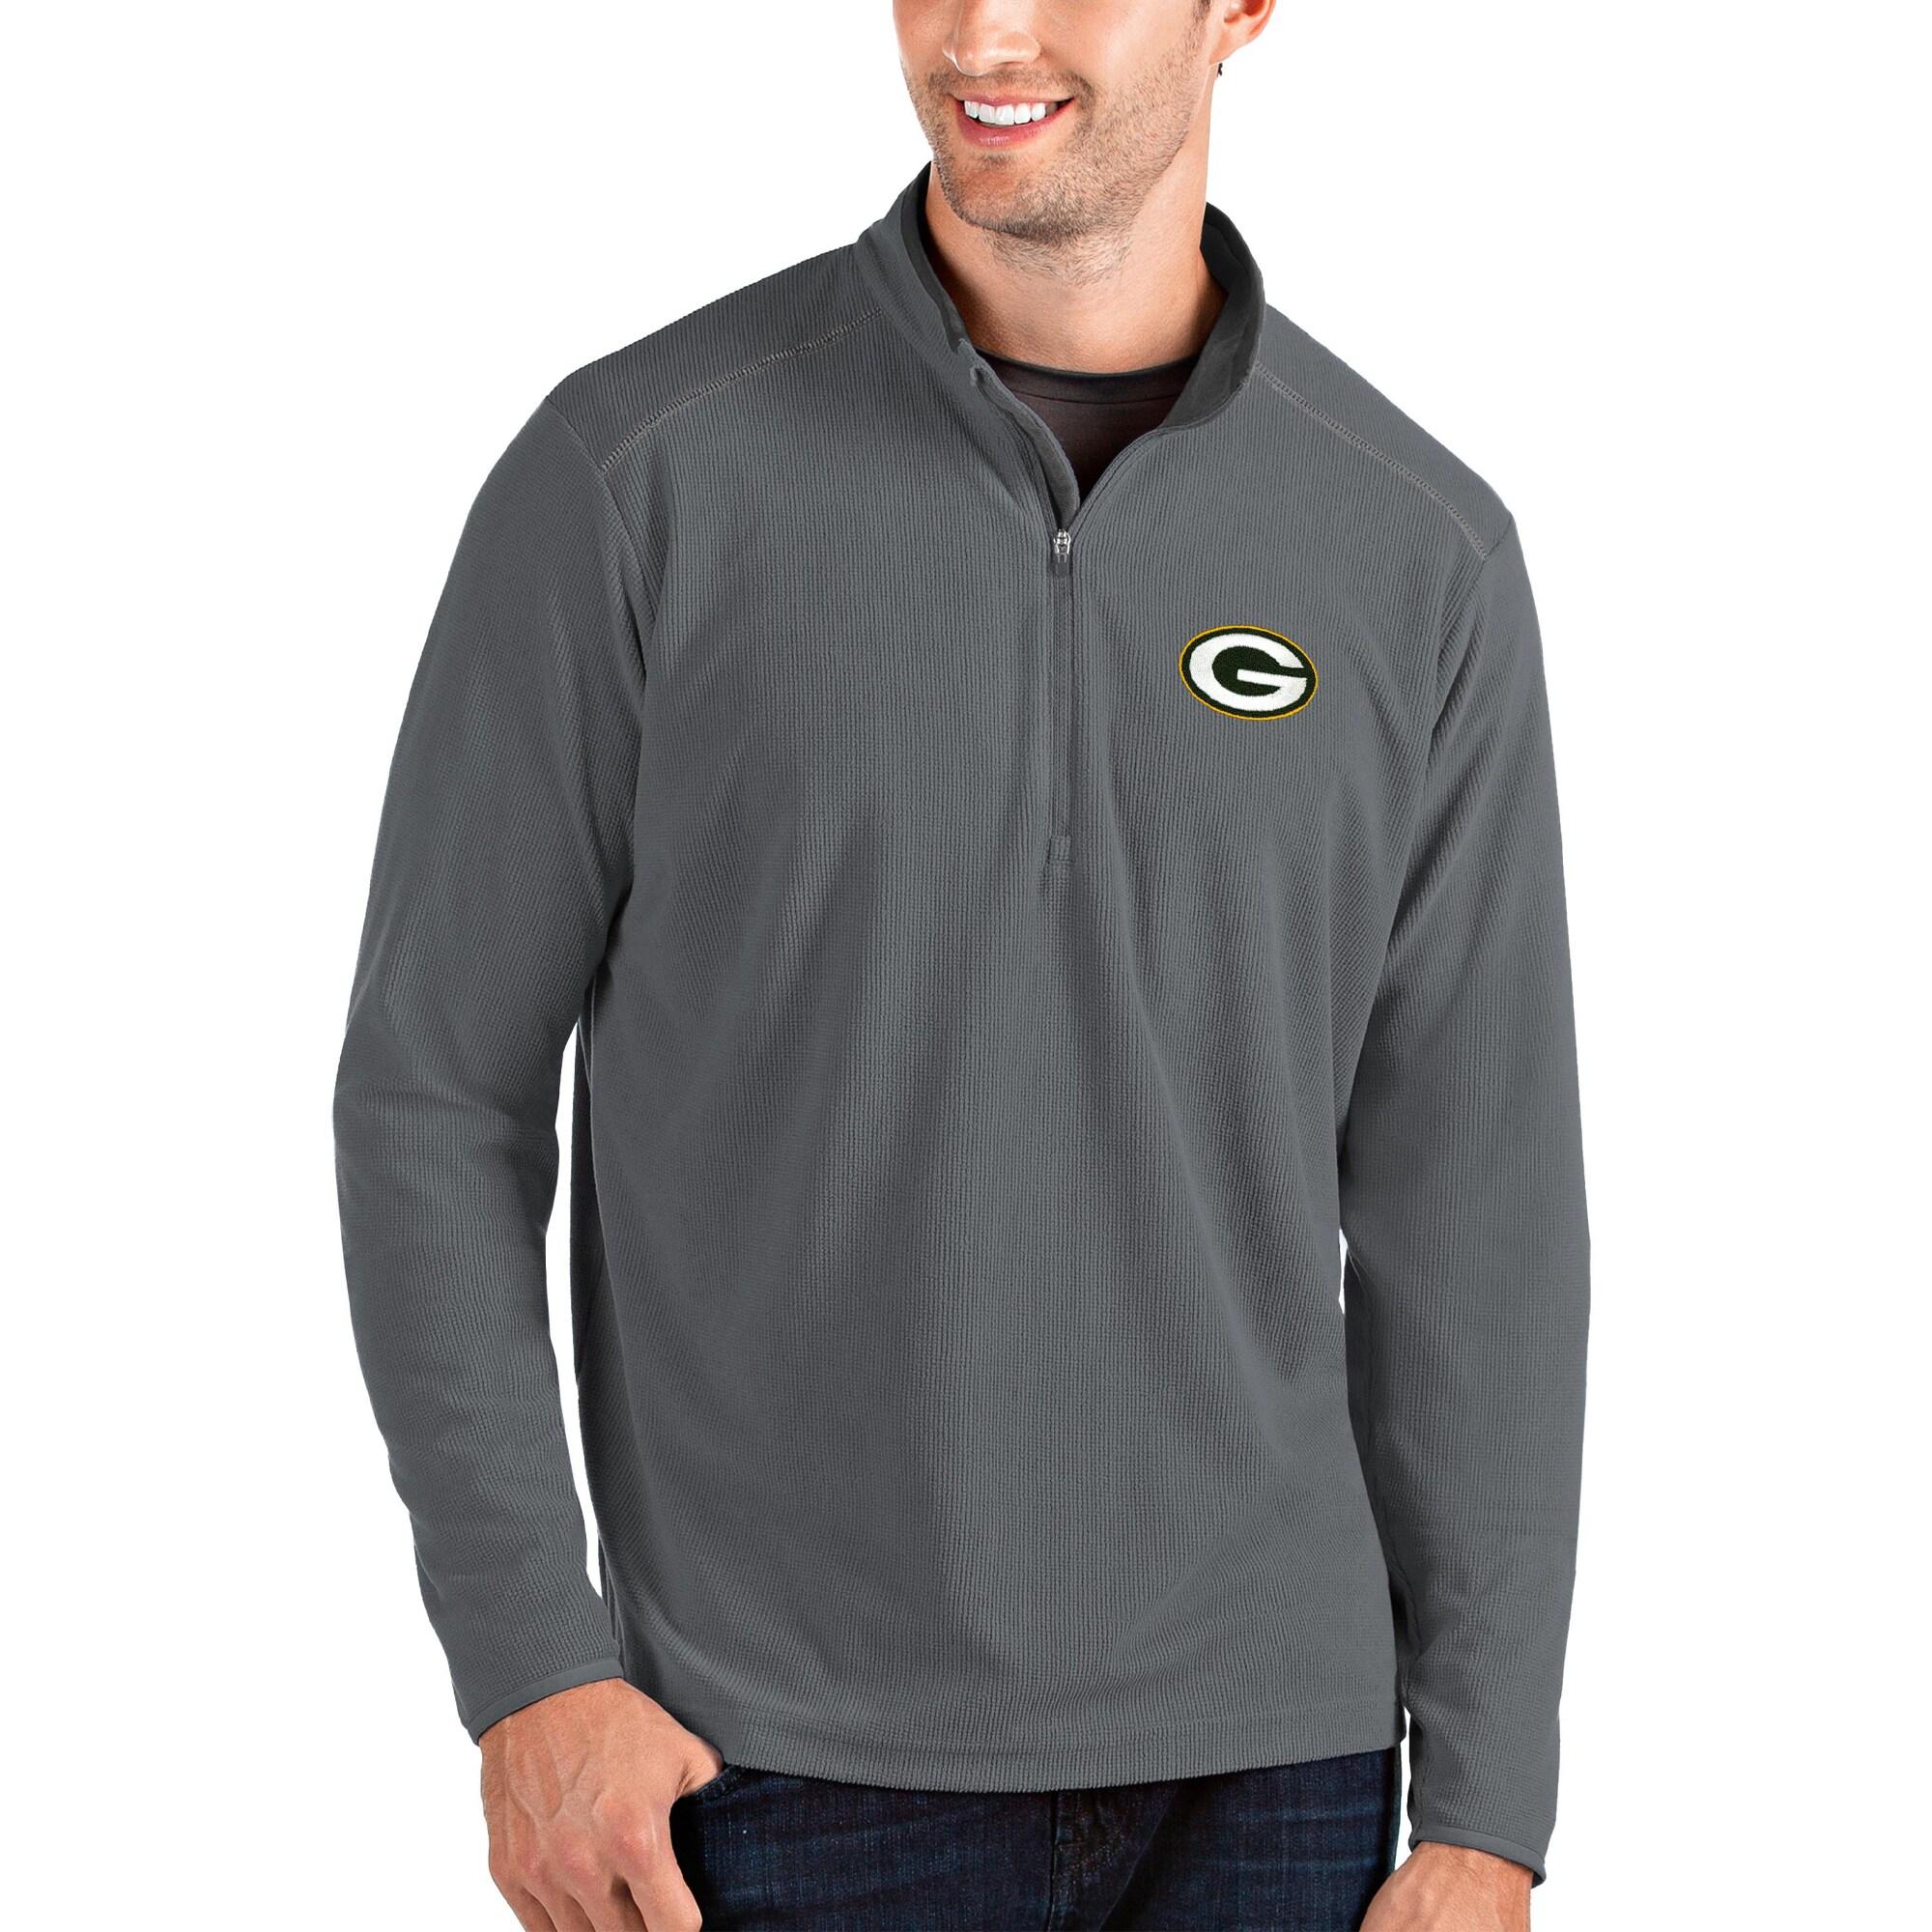 Green Bay Packers Antigua Glacier Quarter-Zip Pullover Jacket - Gray/Gray